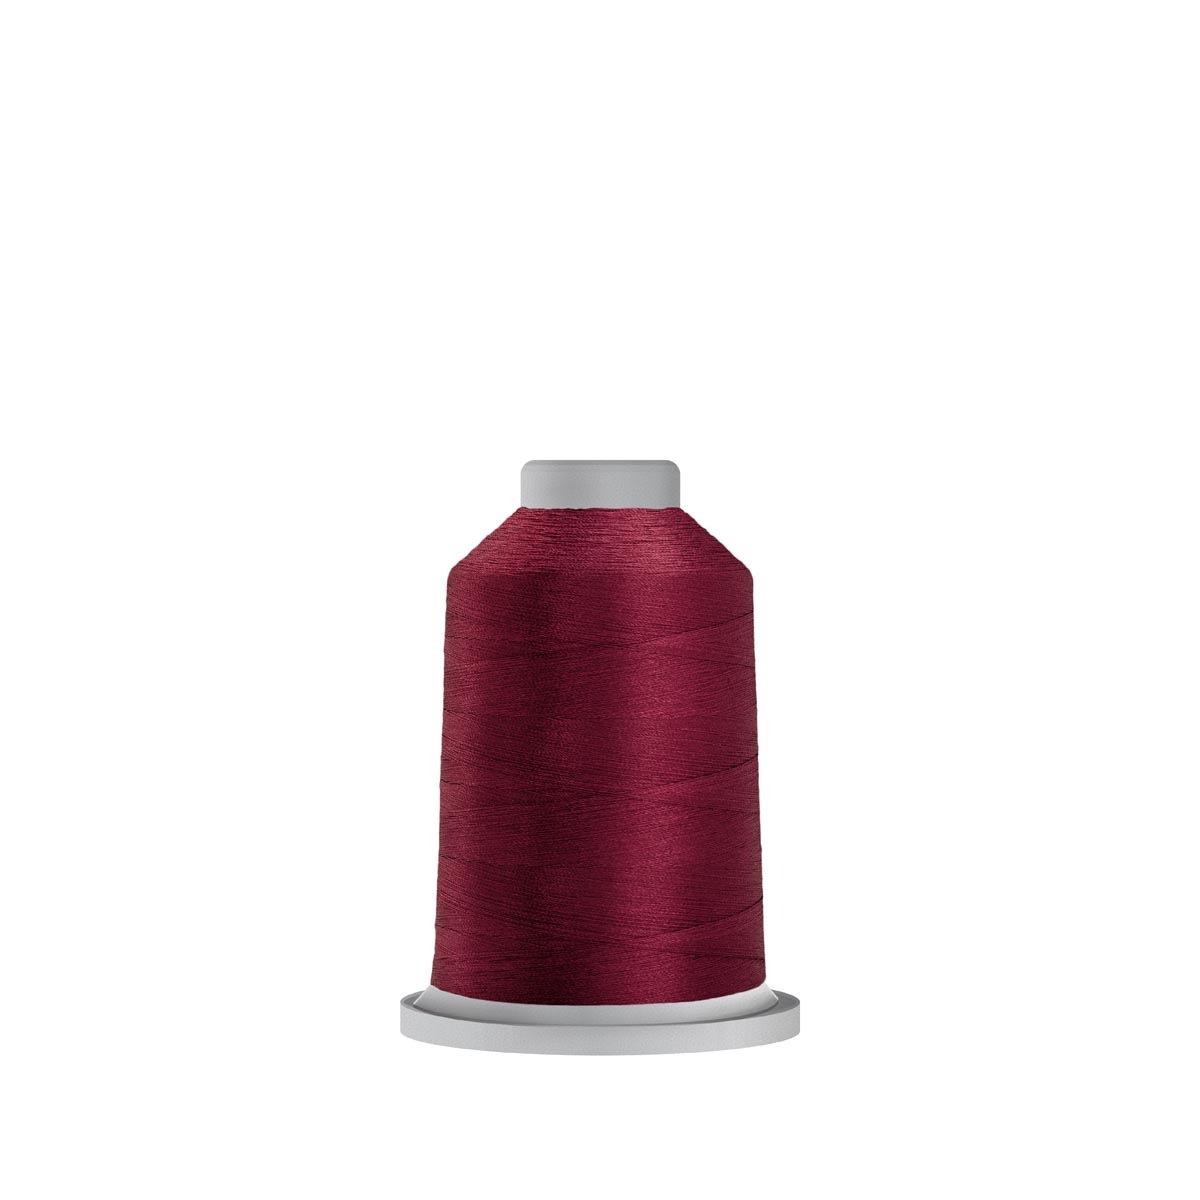 Glide Trilobal Polyester No. 40 Thread - Hokies